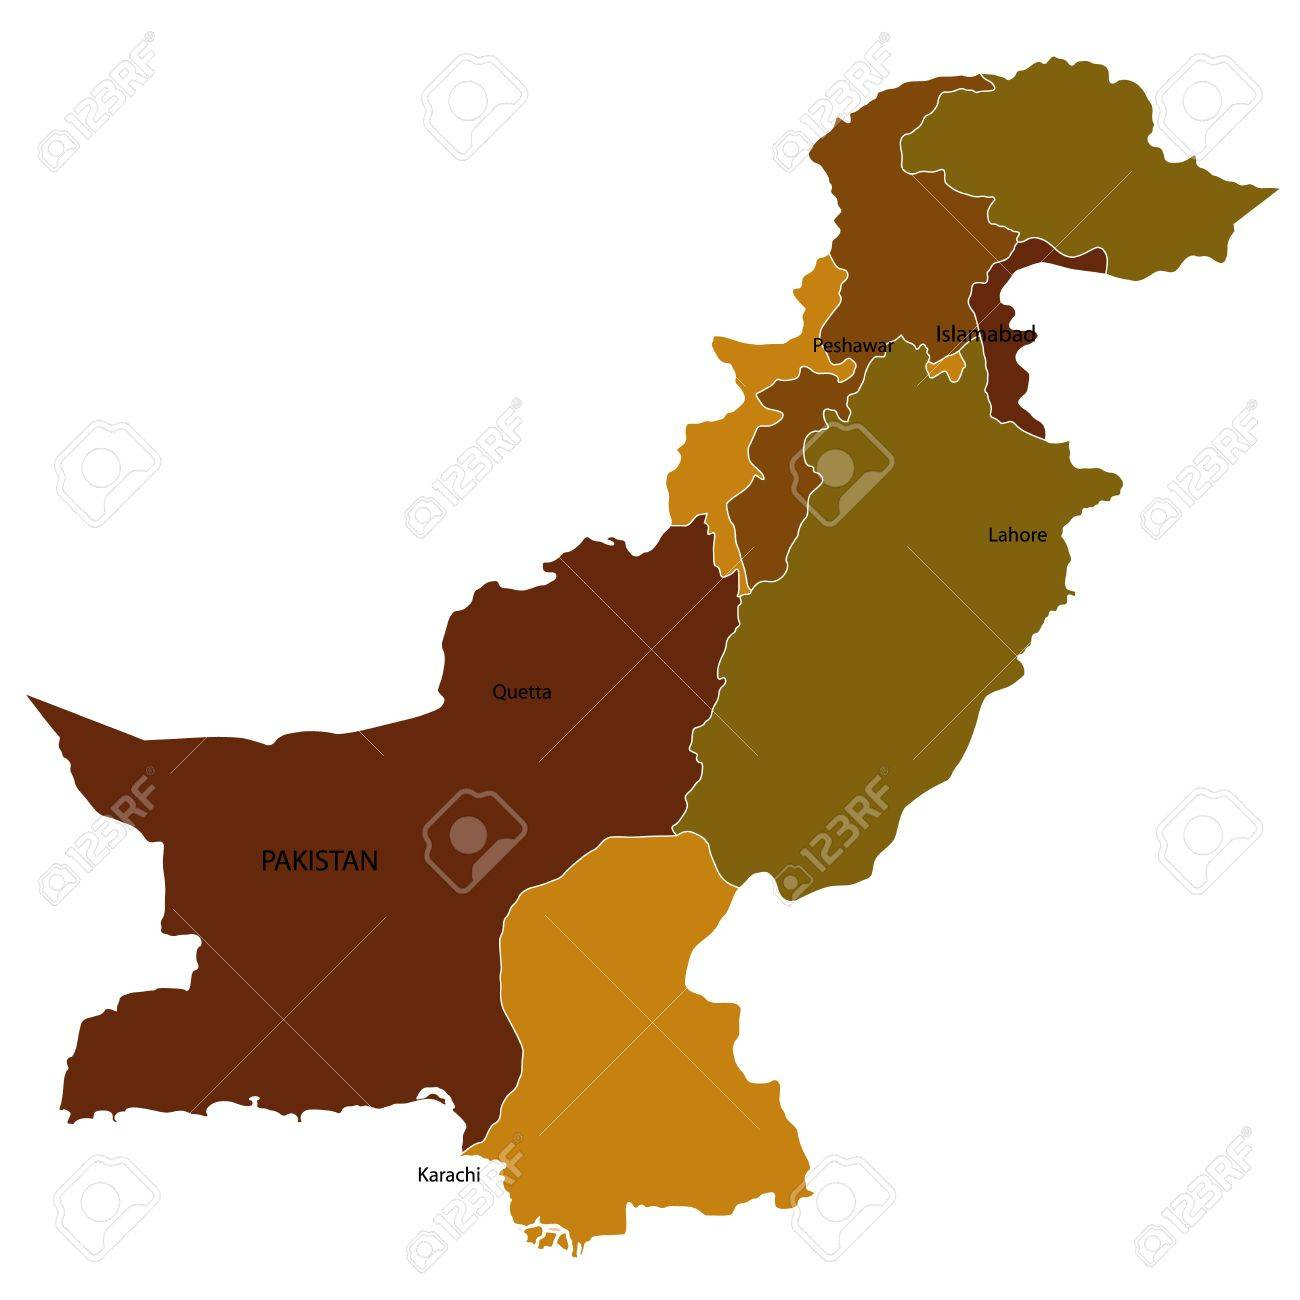 Pakistan Stock Vector - 14844143